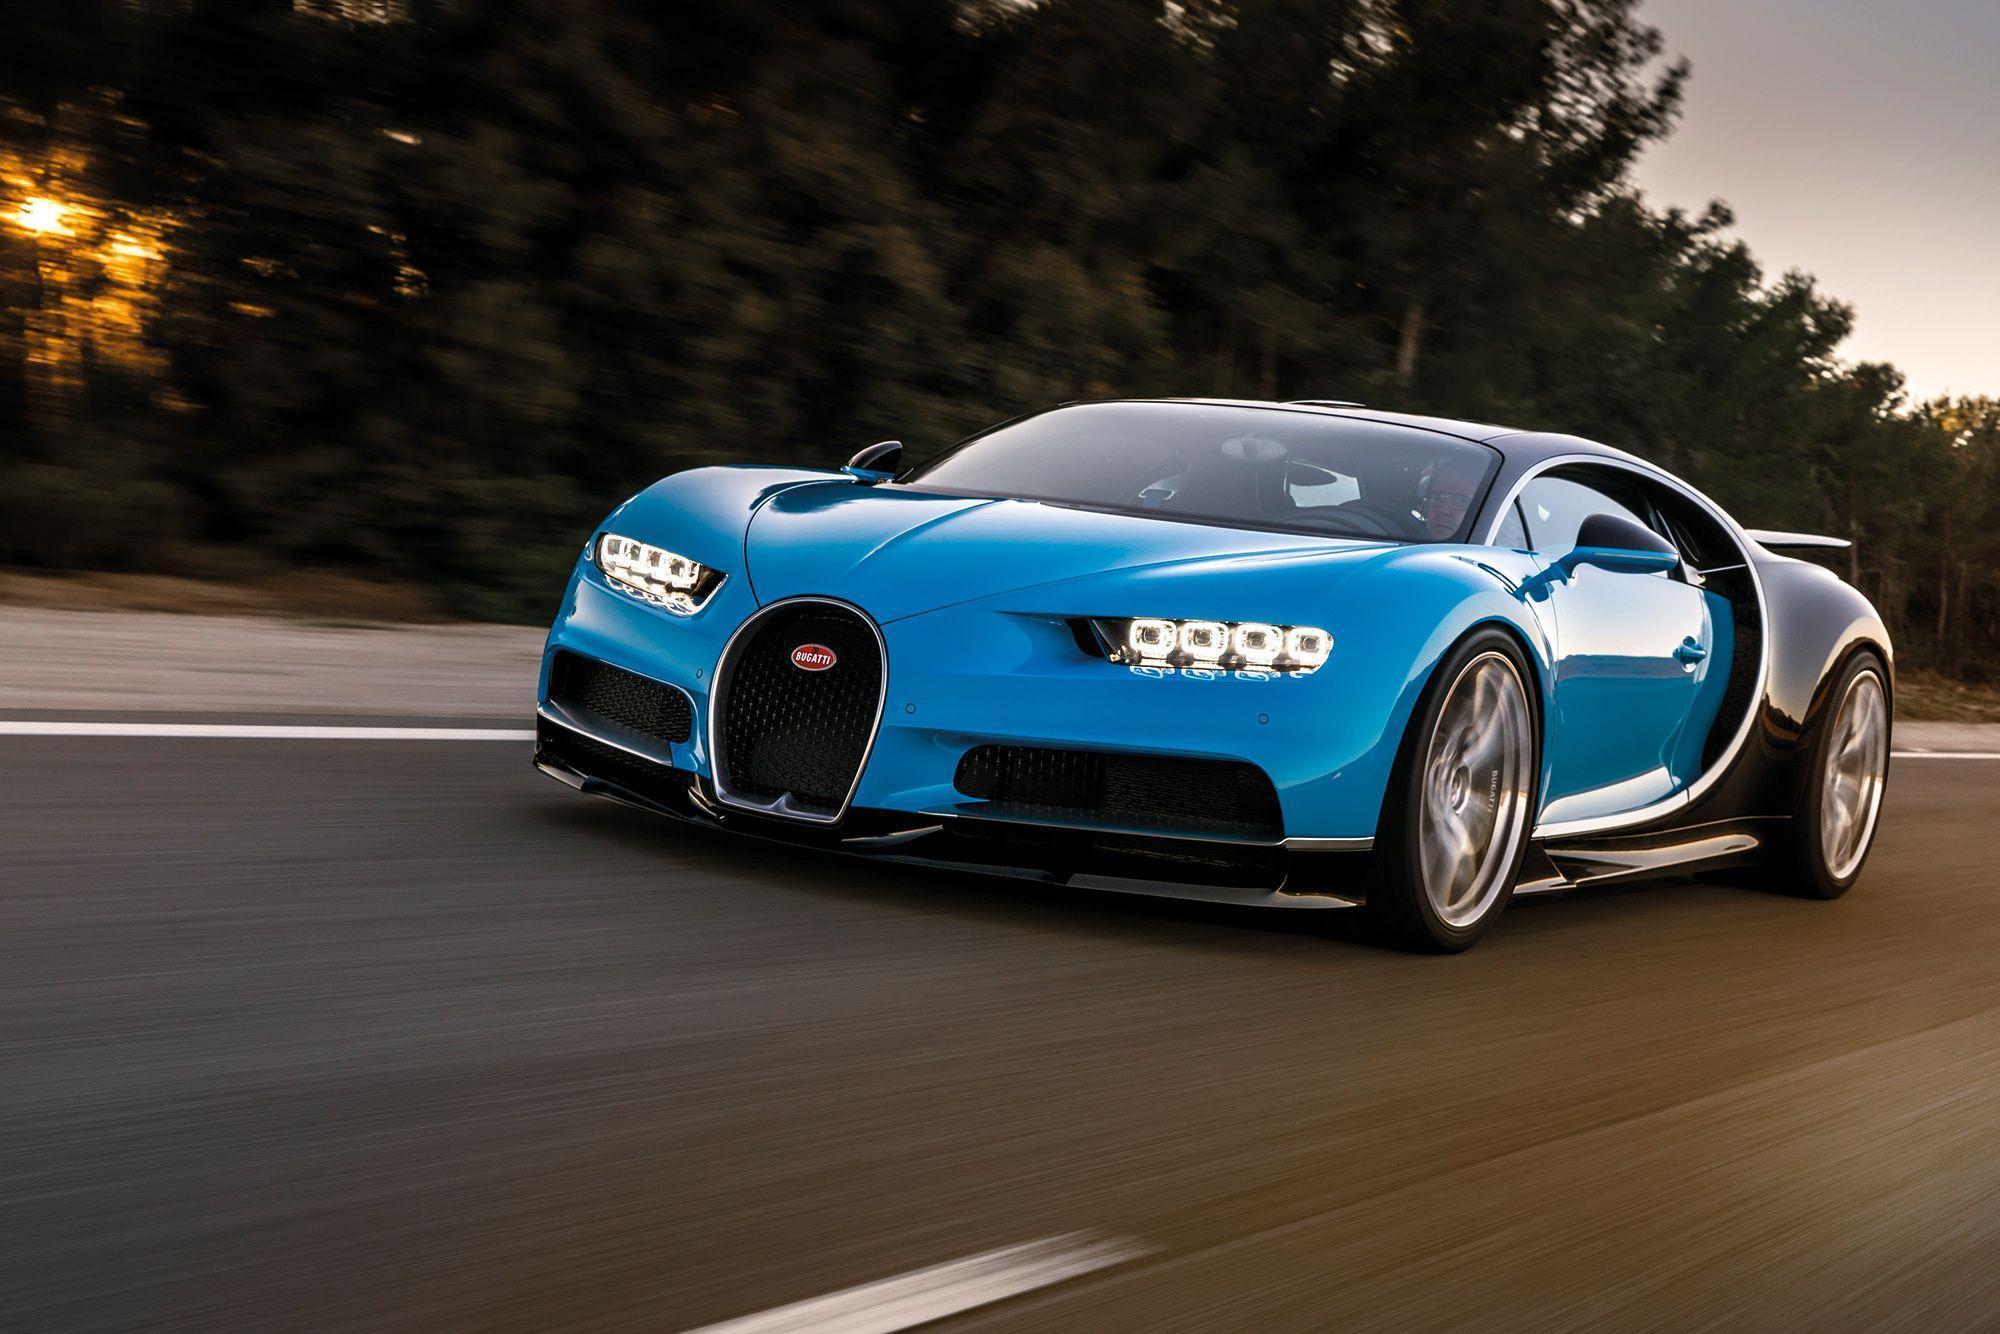 Bugatti Chiron Hd Wallpapers Wallpaper Cave